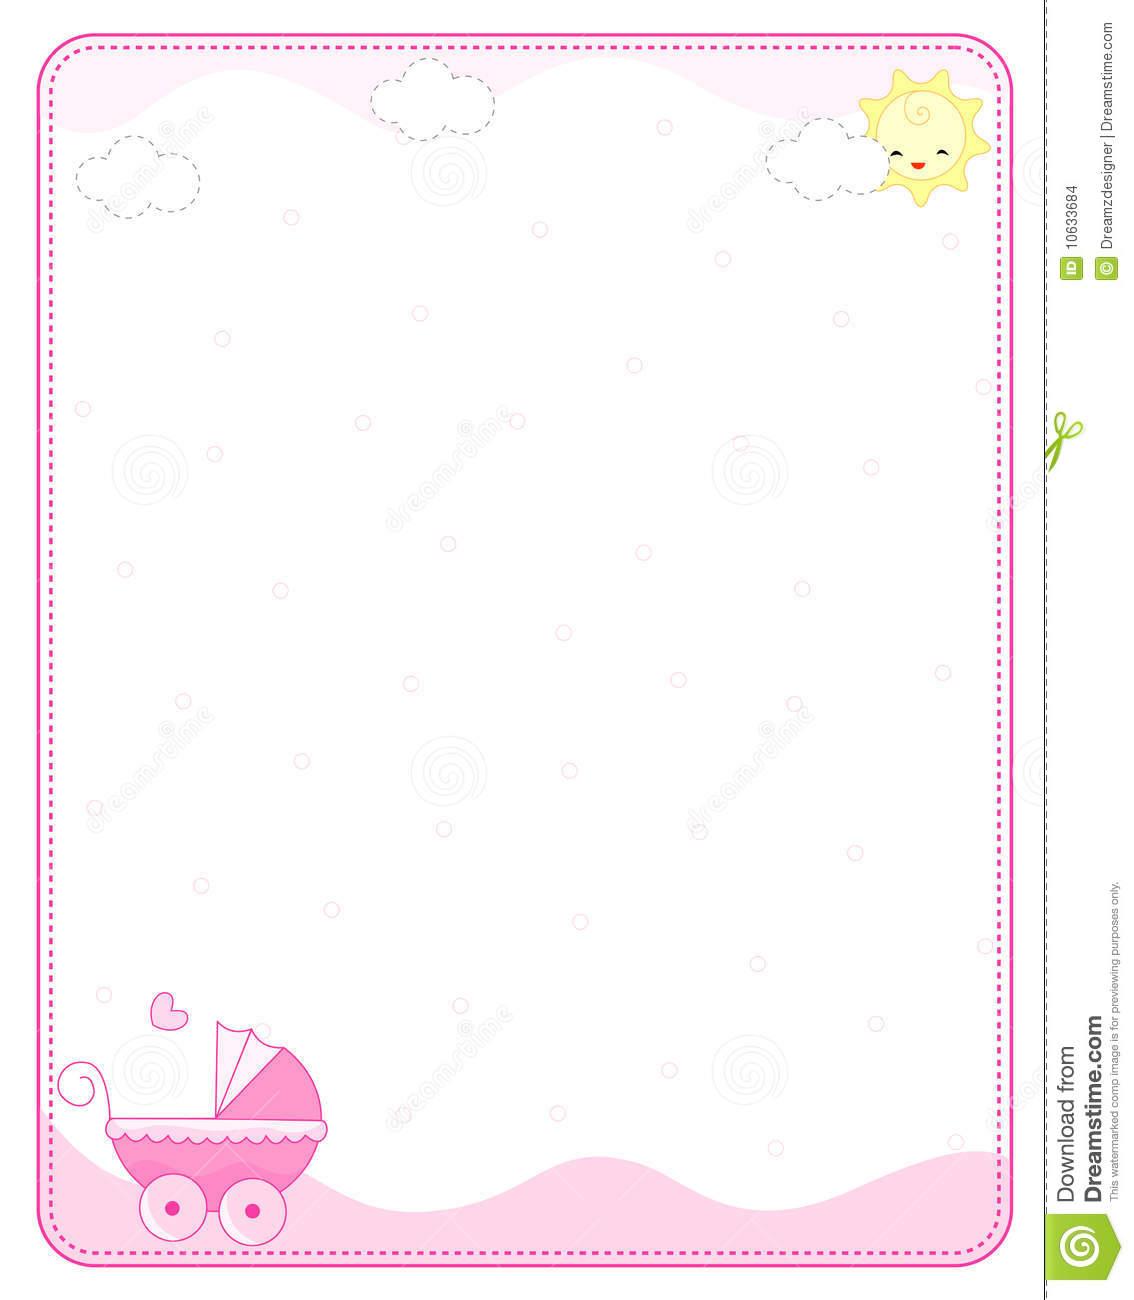 Baby girl border clipart 1 » Clipart Station.